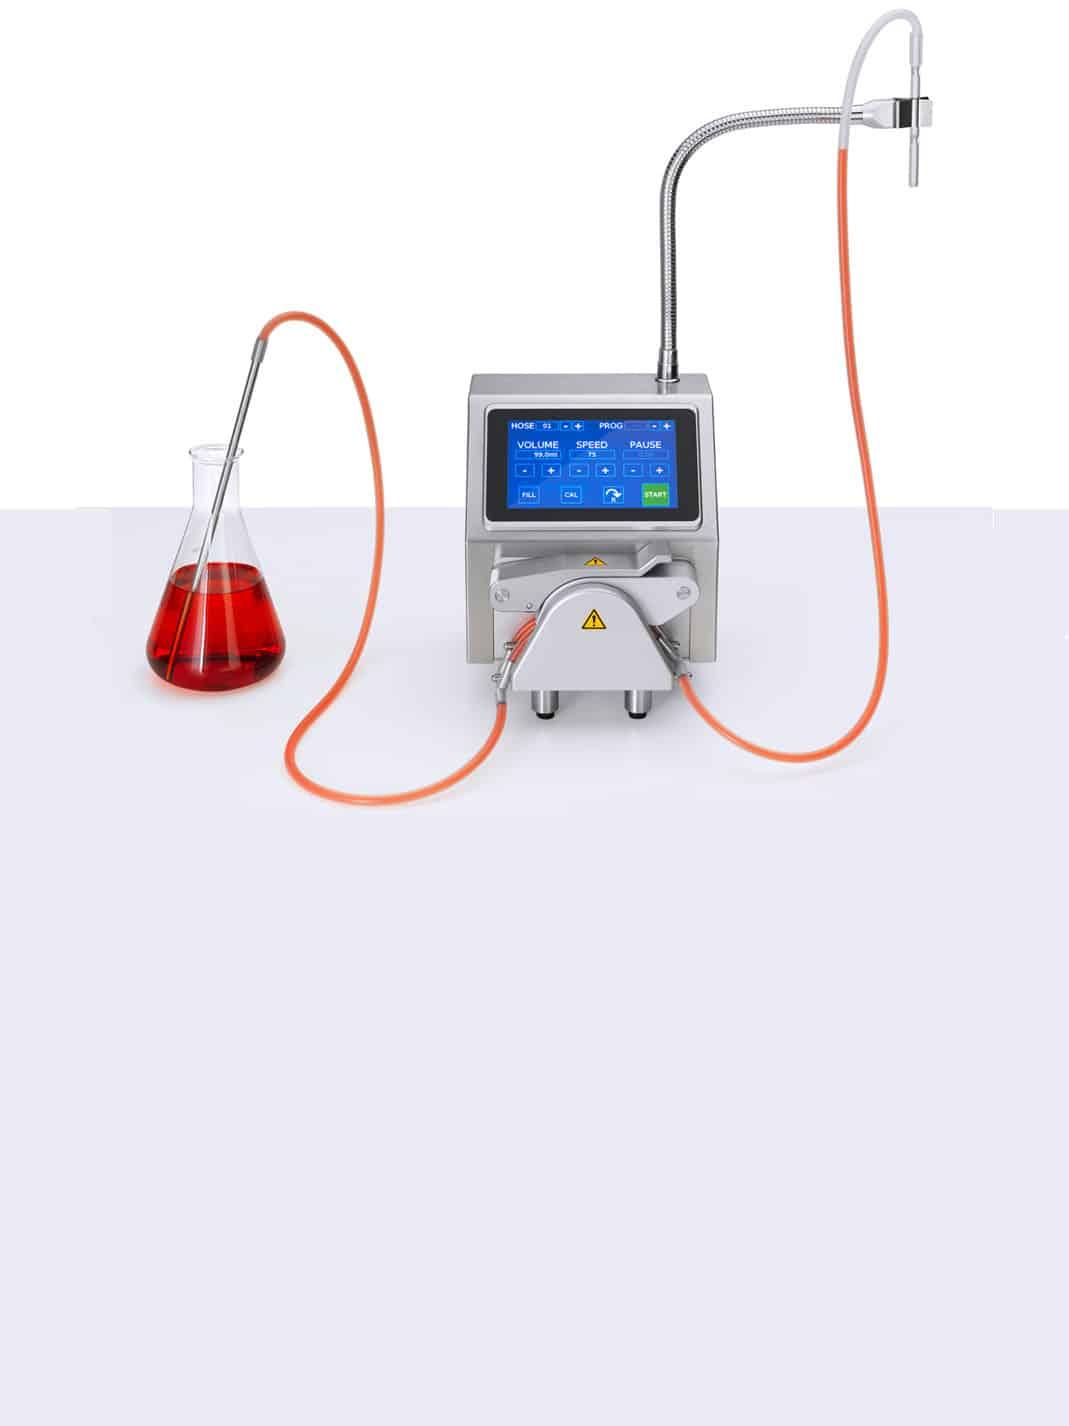 Peristaltikpumpe Systec Mediapump – Präzises Dosieren mit System